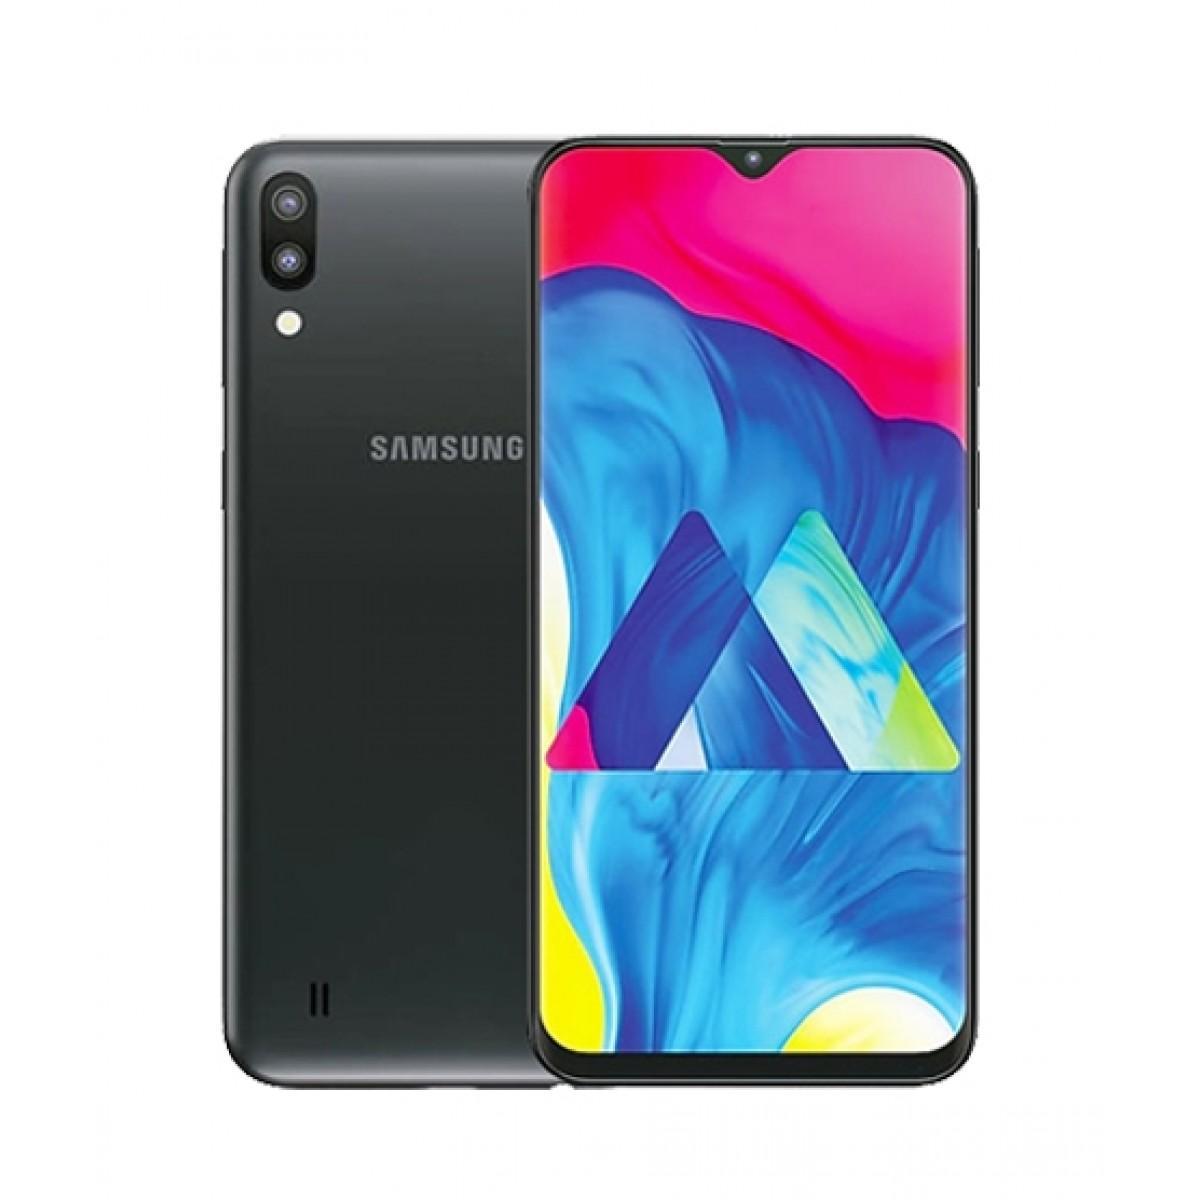 Samsung Galaxy M10 2GB/16GB (COD, Garansi Resmi SAMSUNG, Cicilan tanpa kartu kredit, Cicilan 0%, Gratis Ongkir)